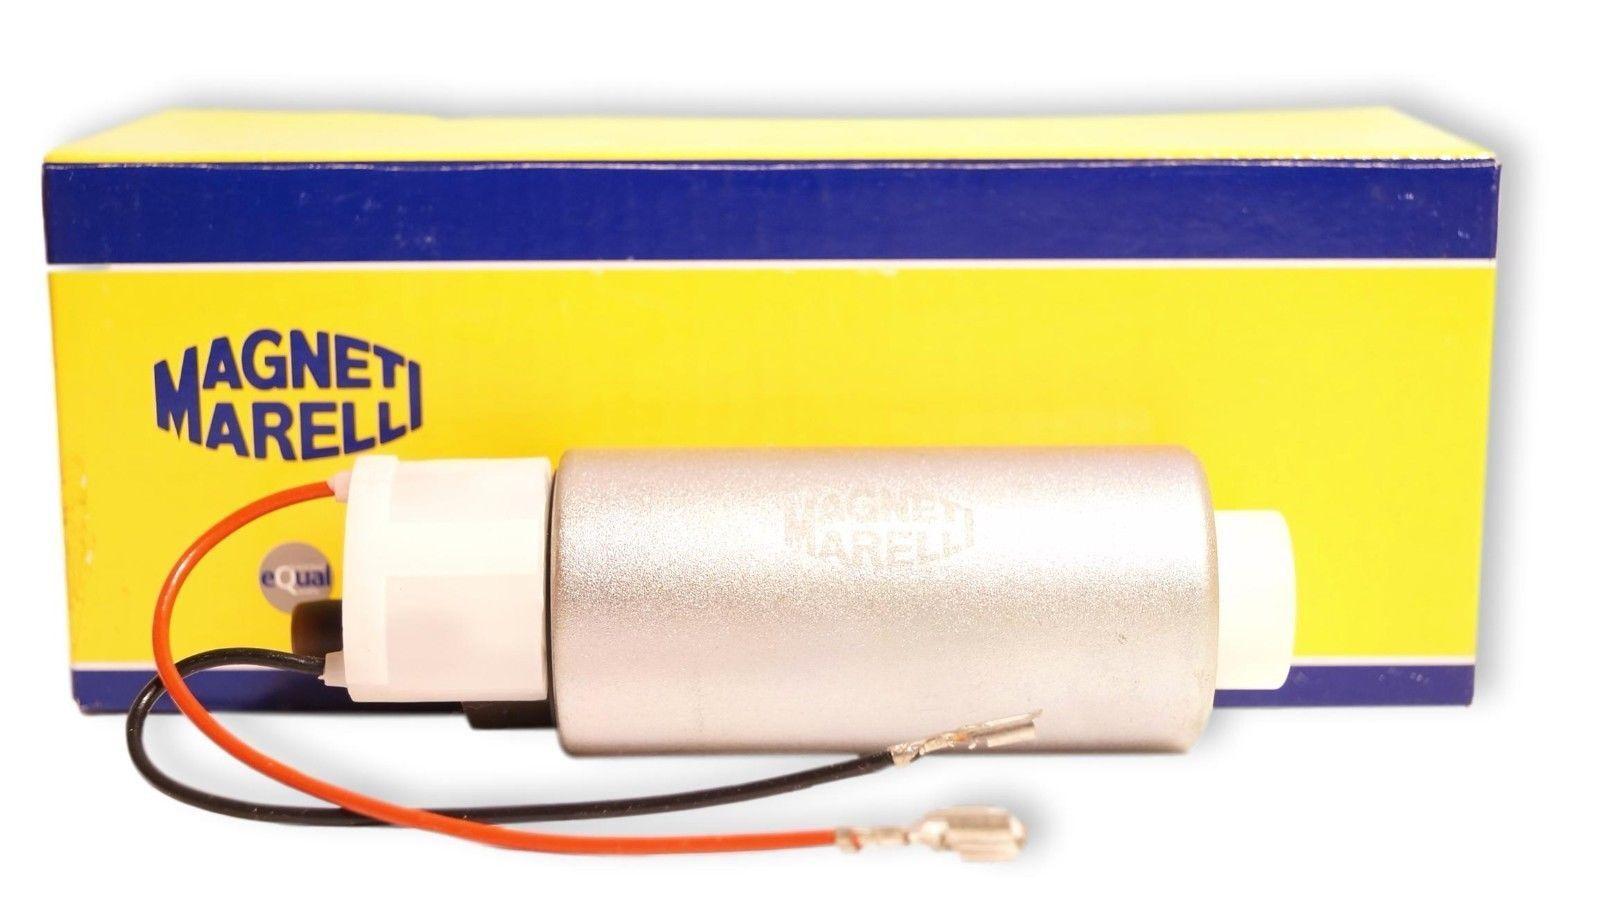 RB /_ MAGNETI MARELLI en Réservoir Pompe à carburant pour FORD KA //MAM00037// RB /_ KA Boîte